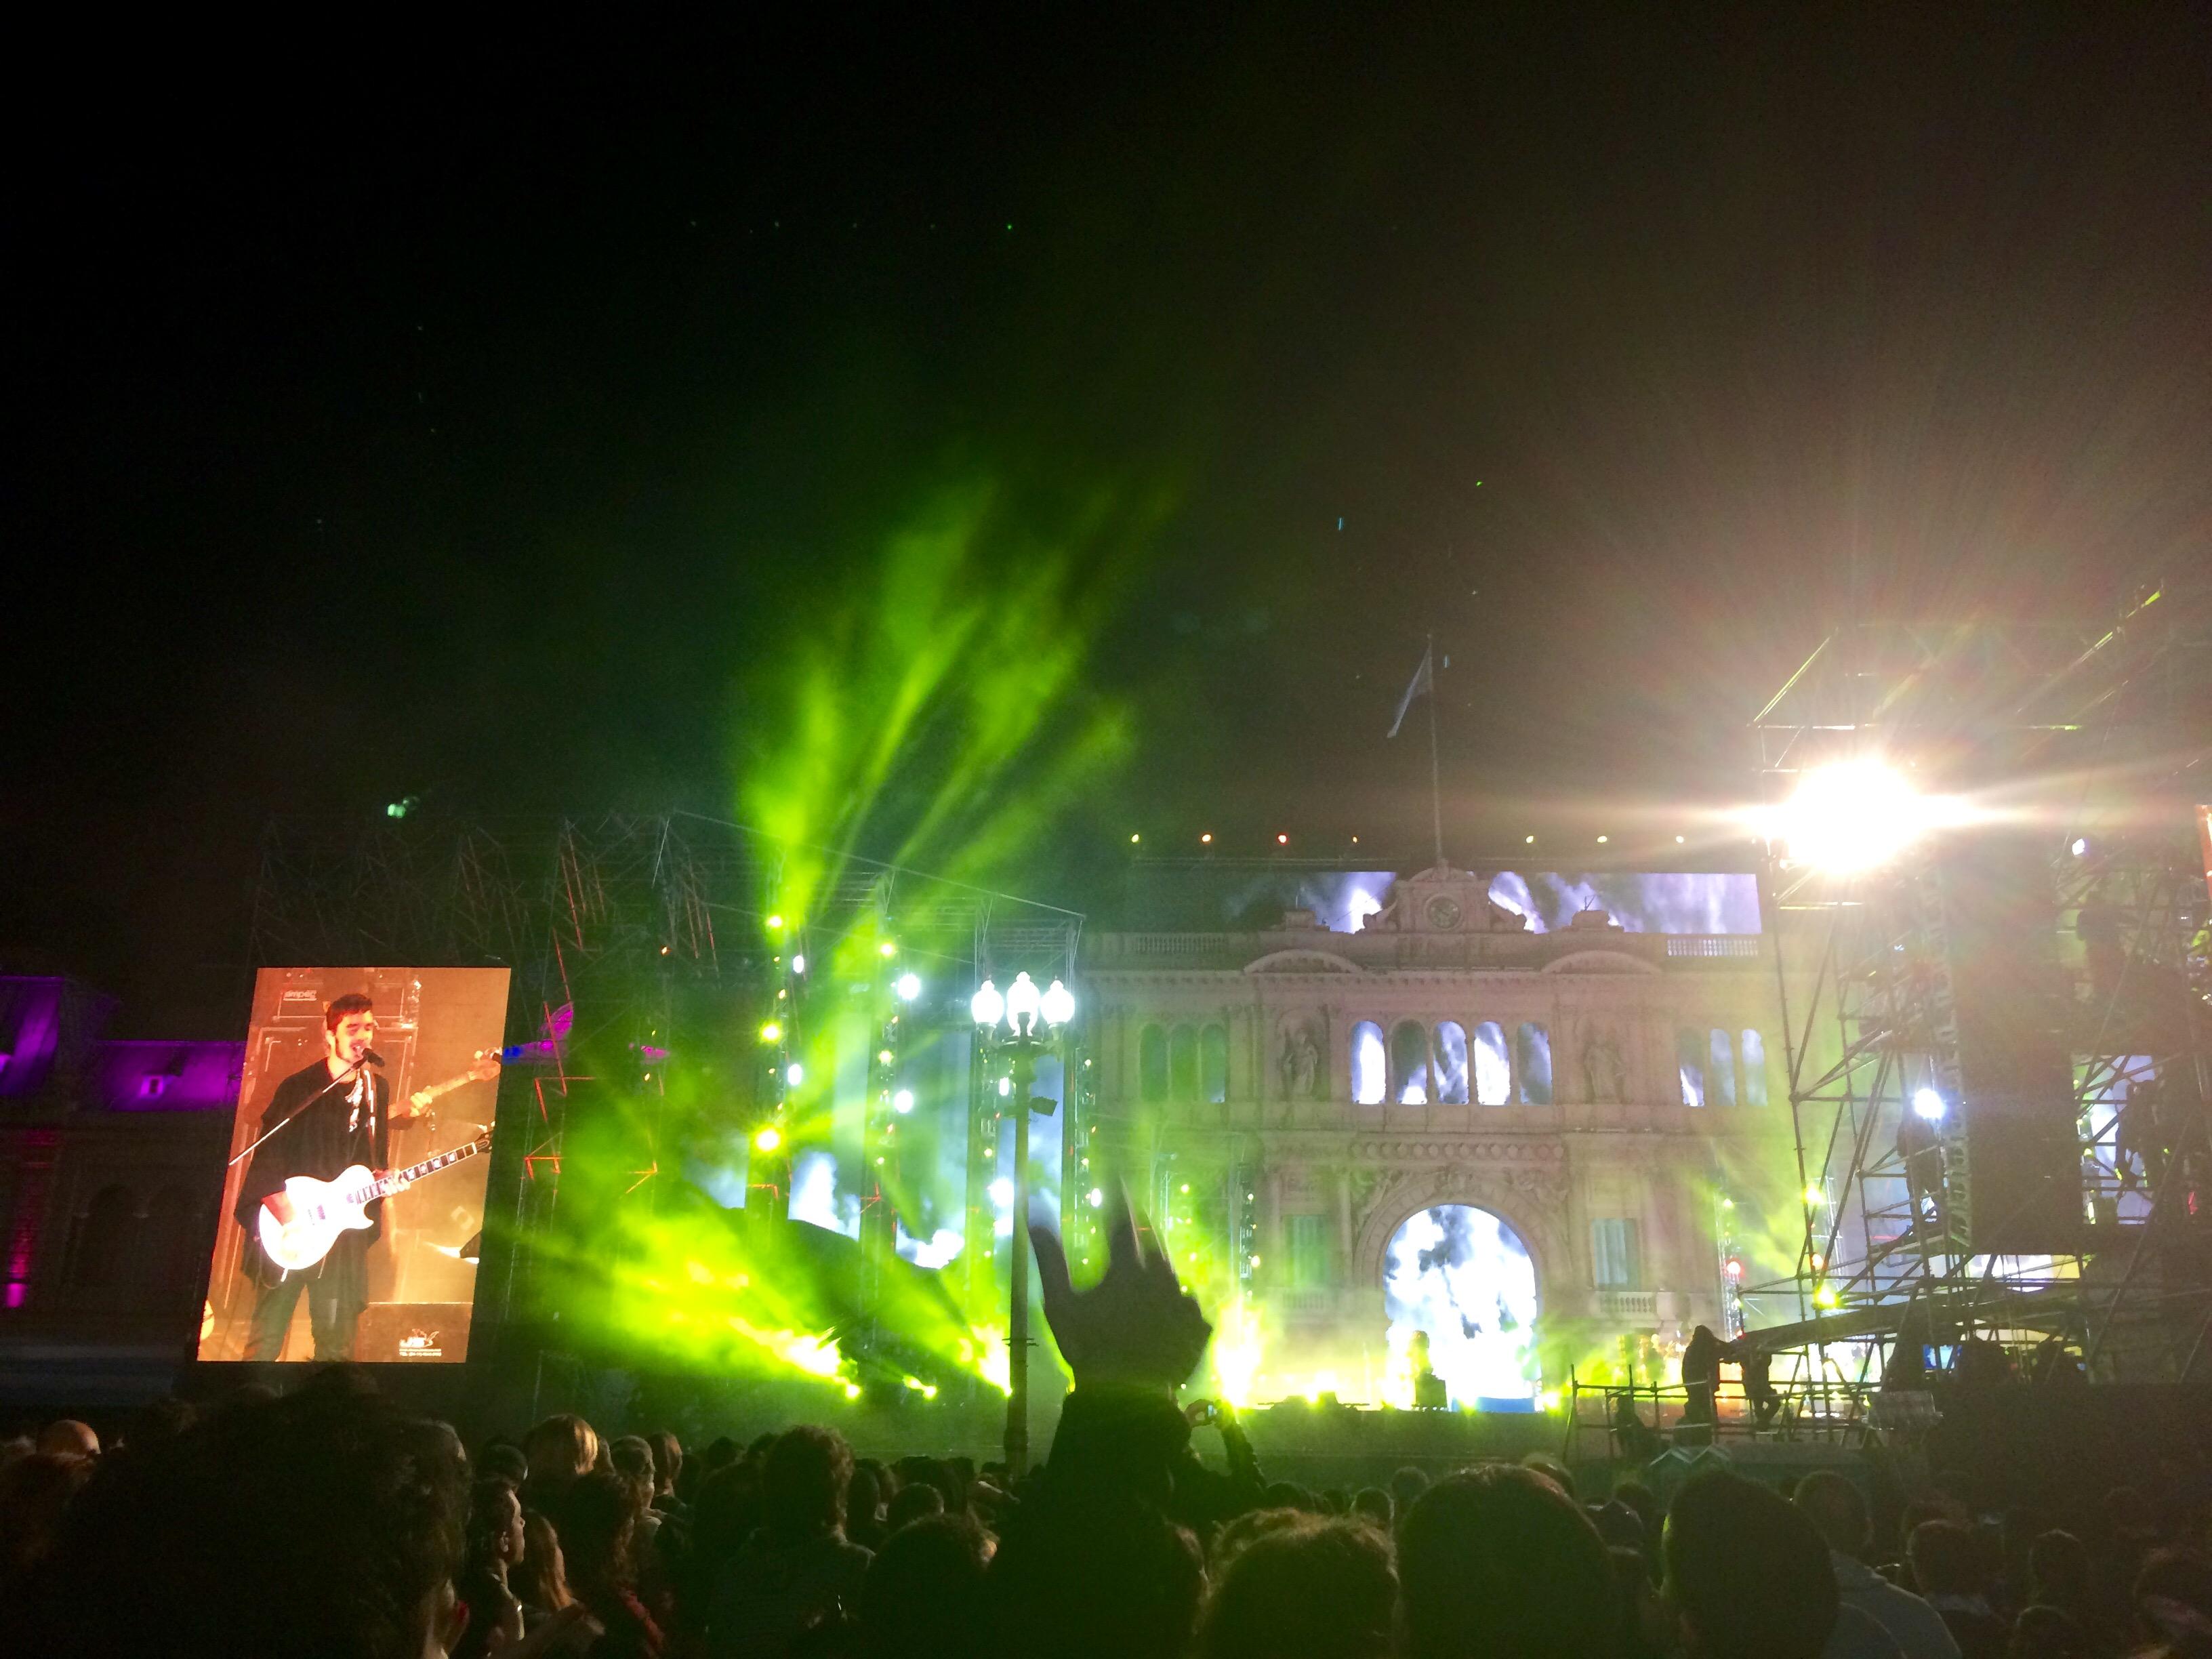 BA concert